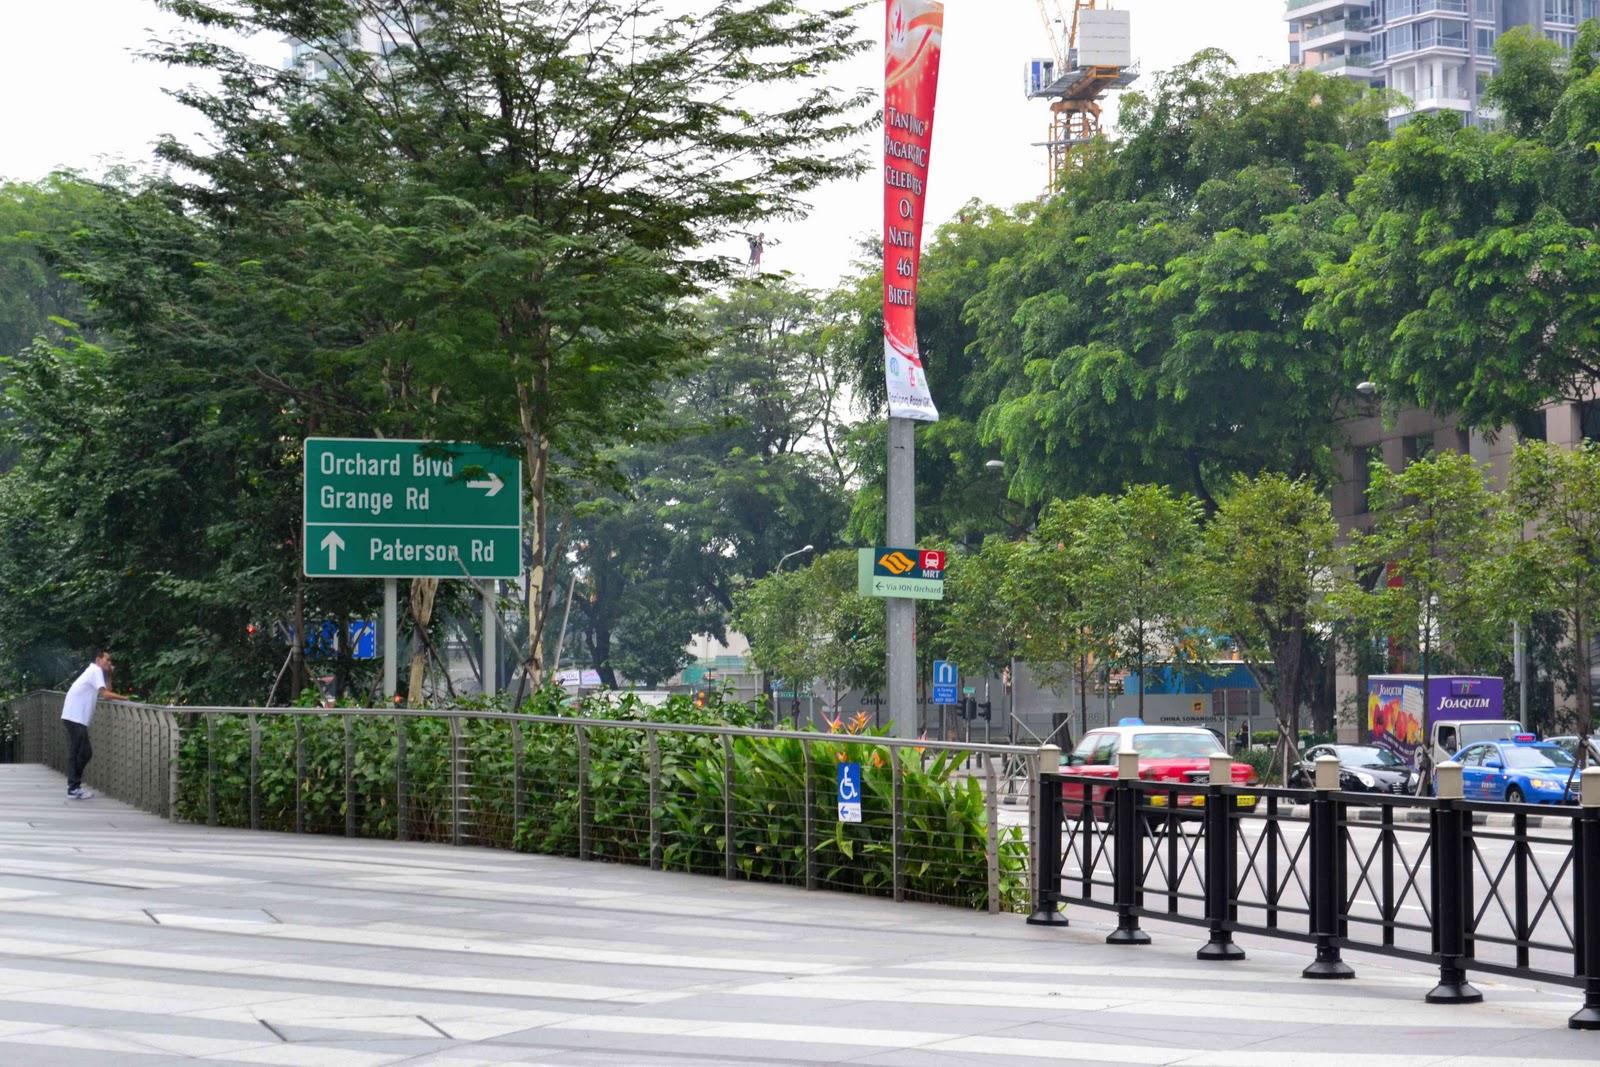 Regent forex cargo lucky plaza singapore